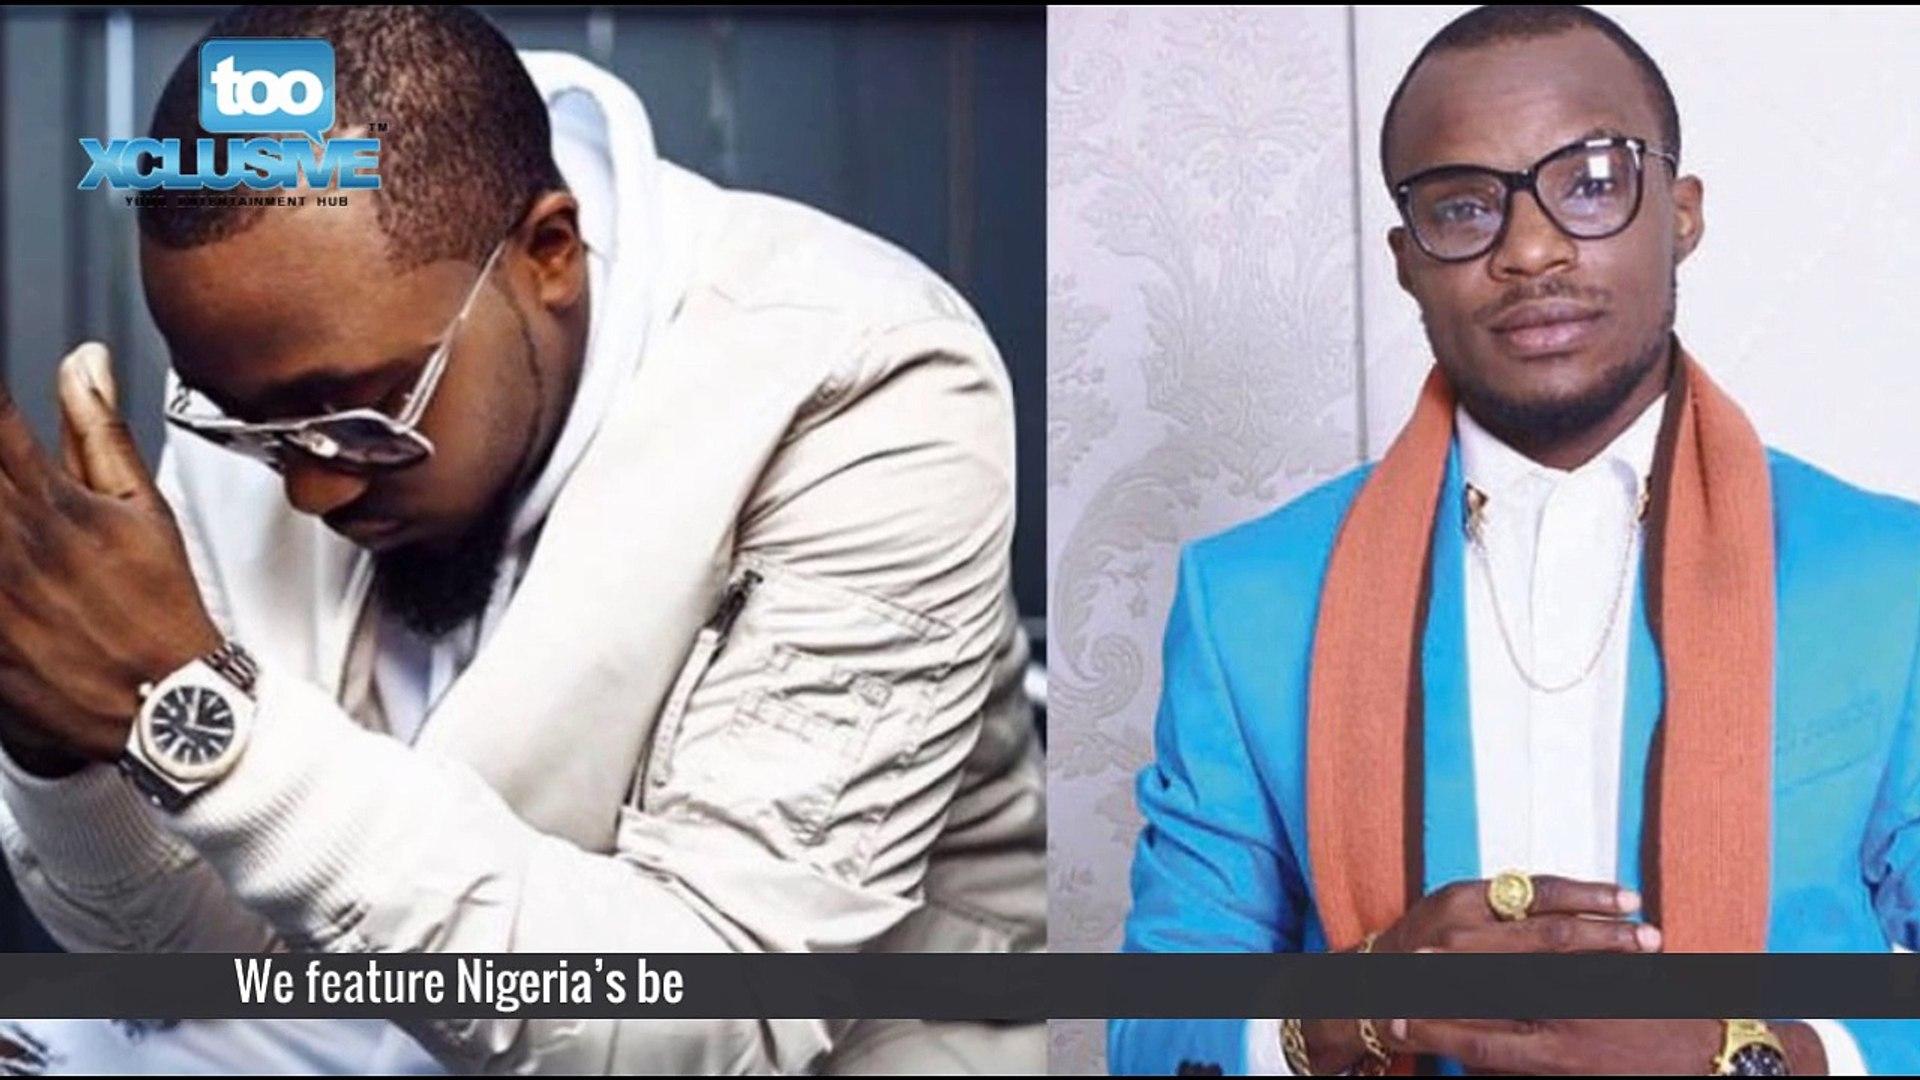 Download nigerian music -TooXclusive.com